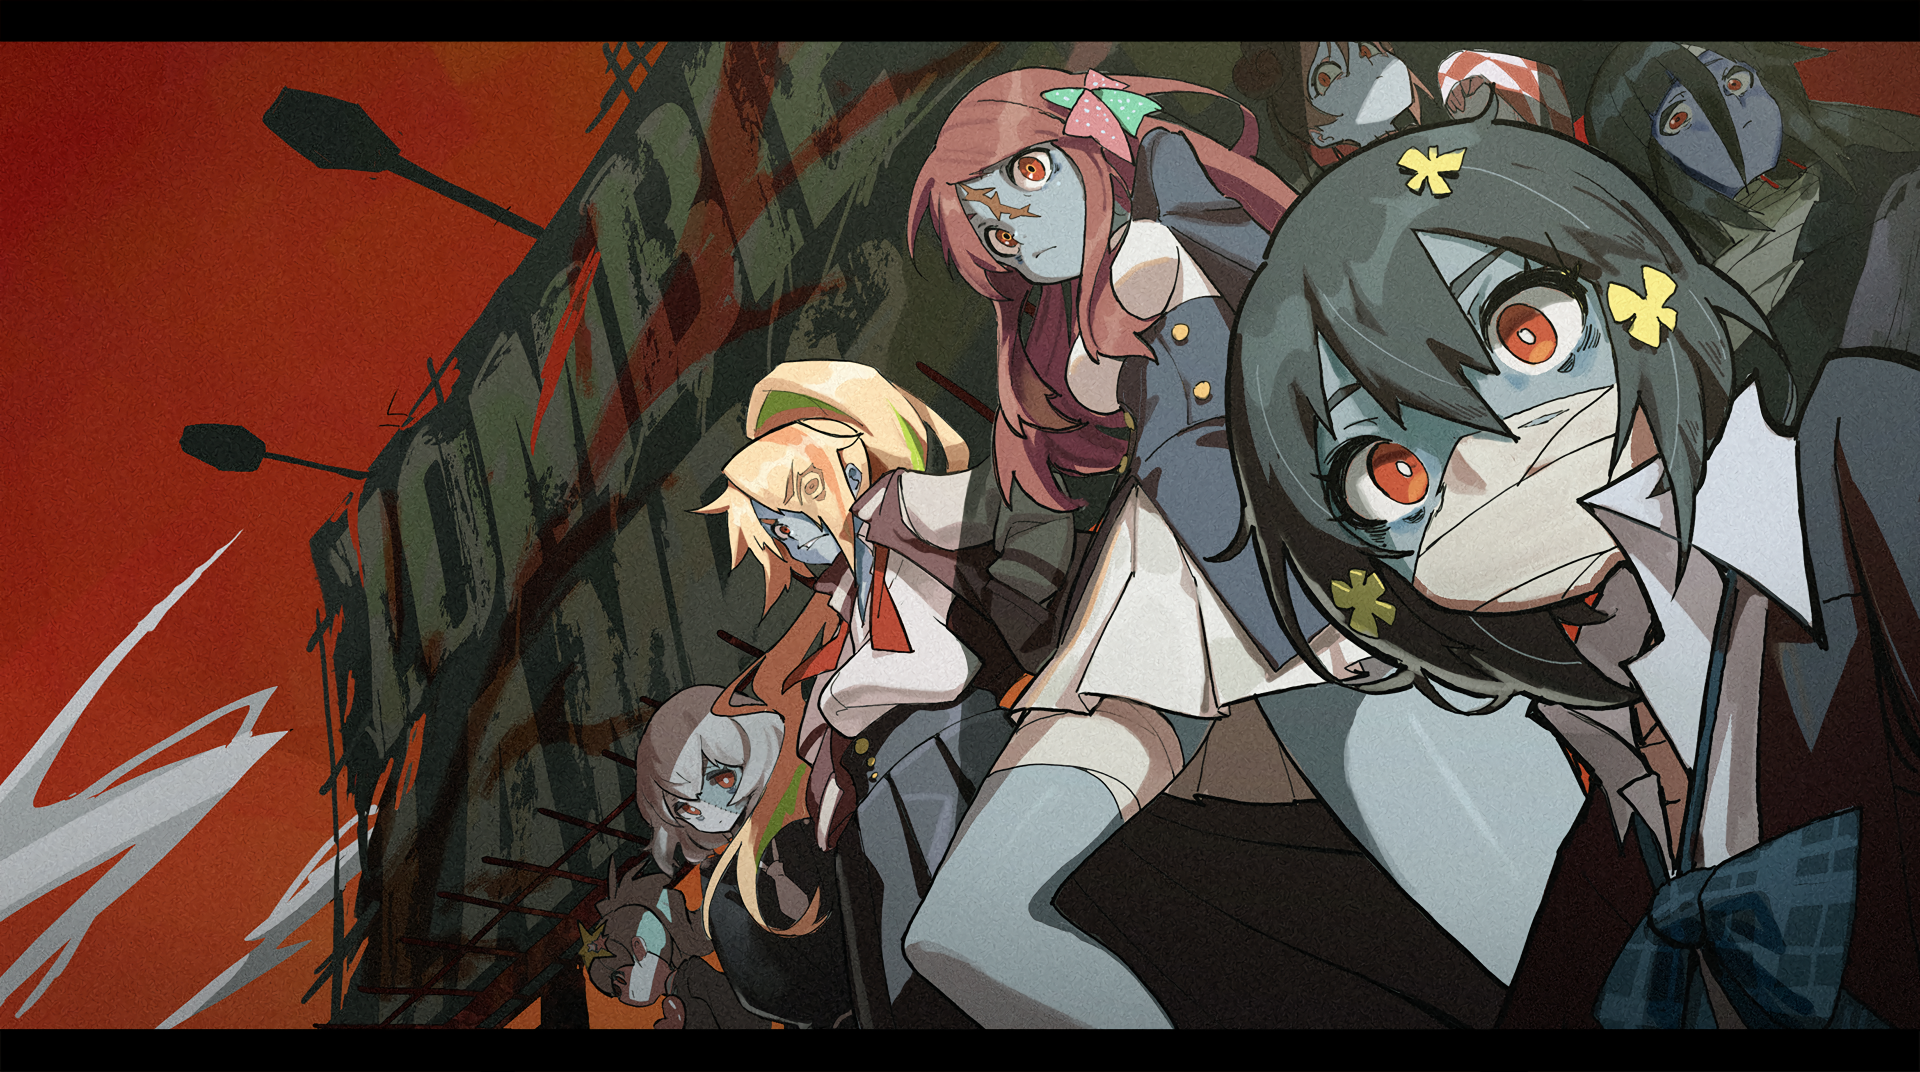 asami anime live wallpaper apk